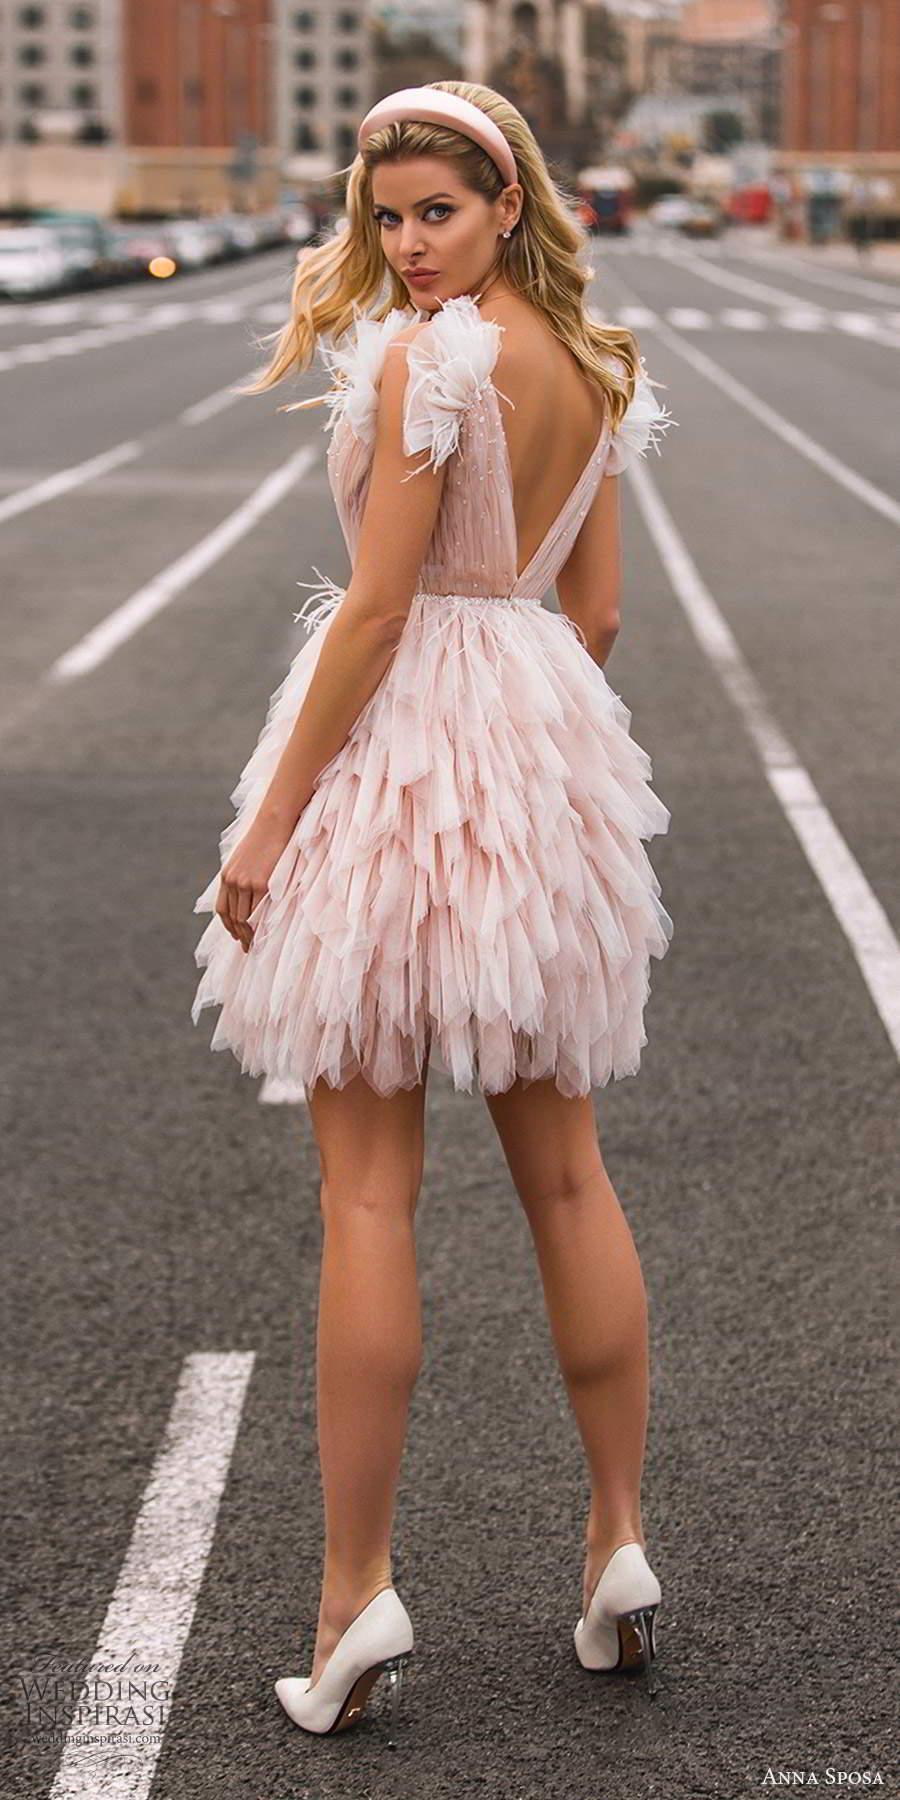 anna sposa 2021 bridal sleeveless straps plunging v neckline ruched bodice short a line pink blush wedding dress ruffle skirt (24) bv